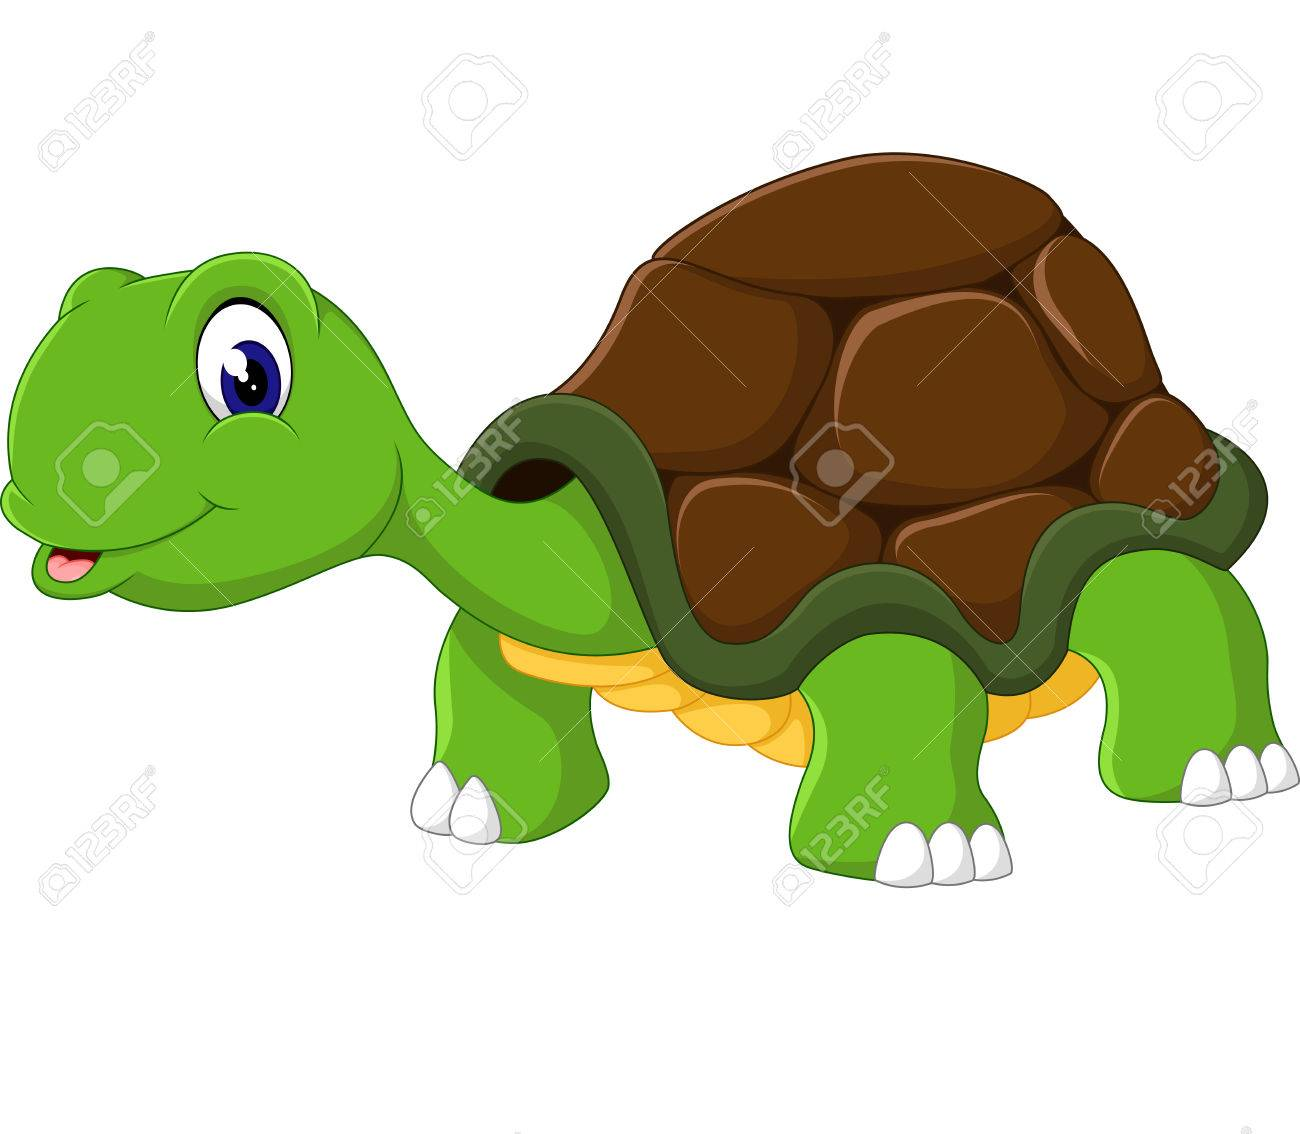 Cute cartoon turtle - 49057458